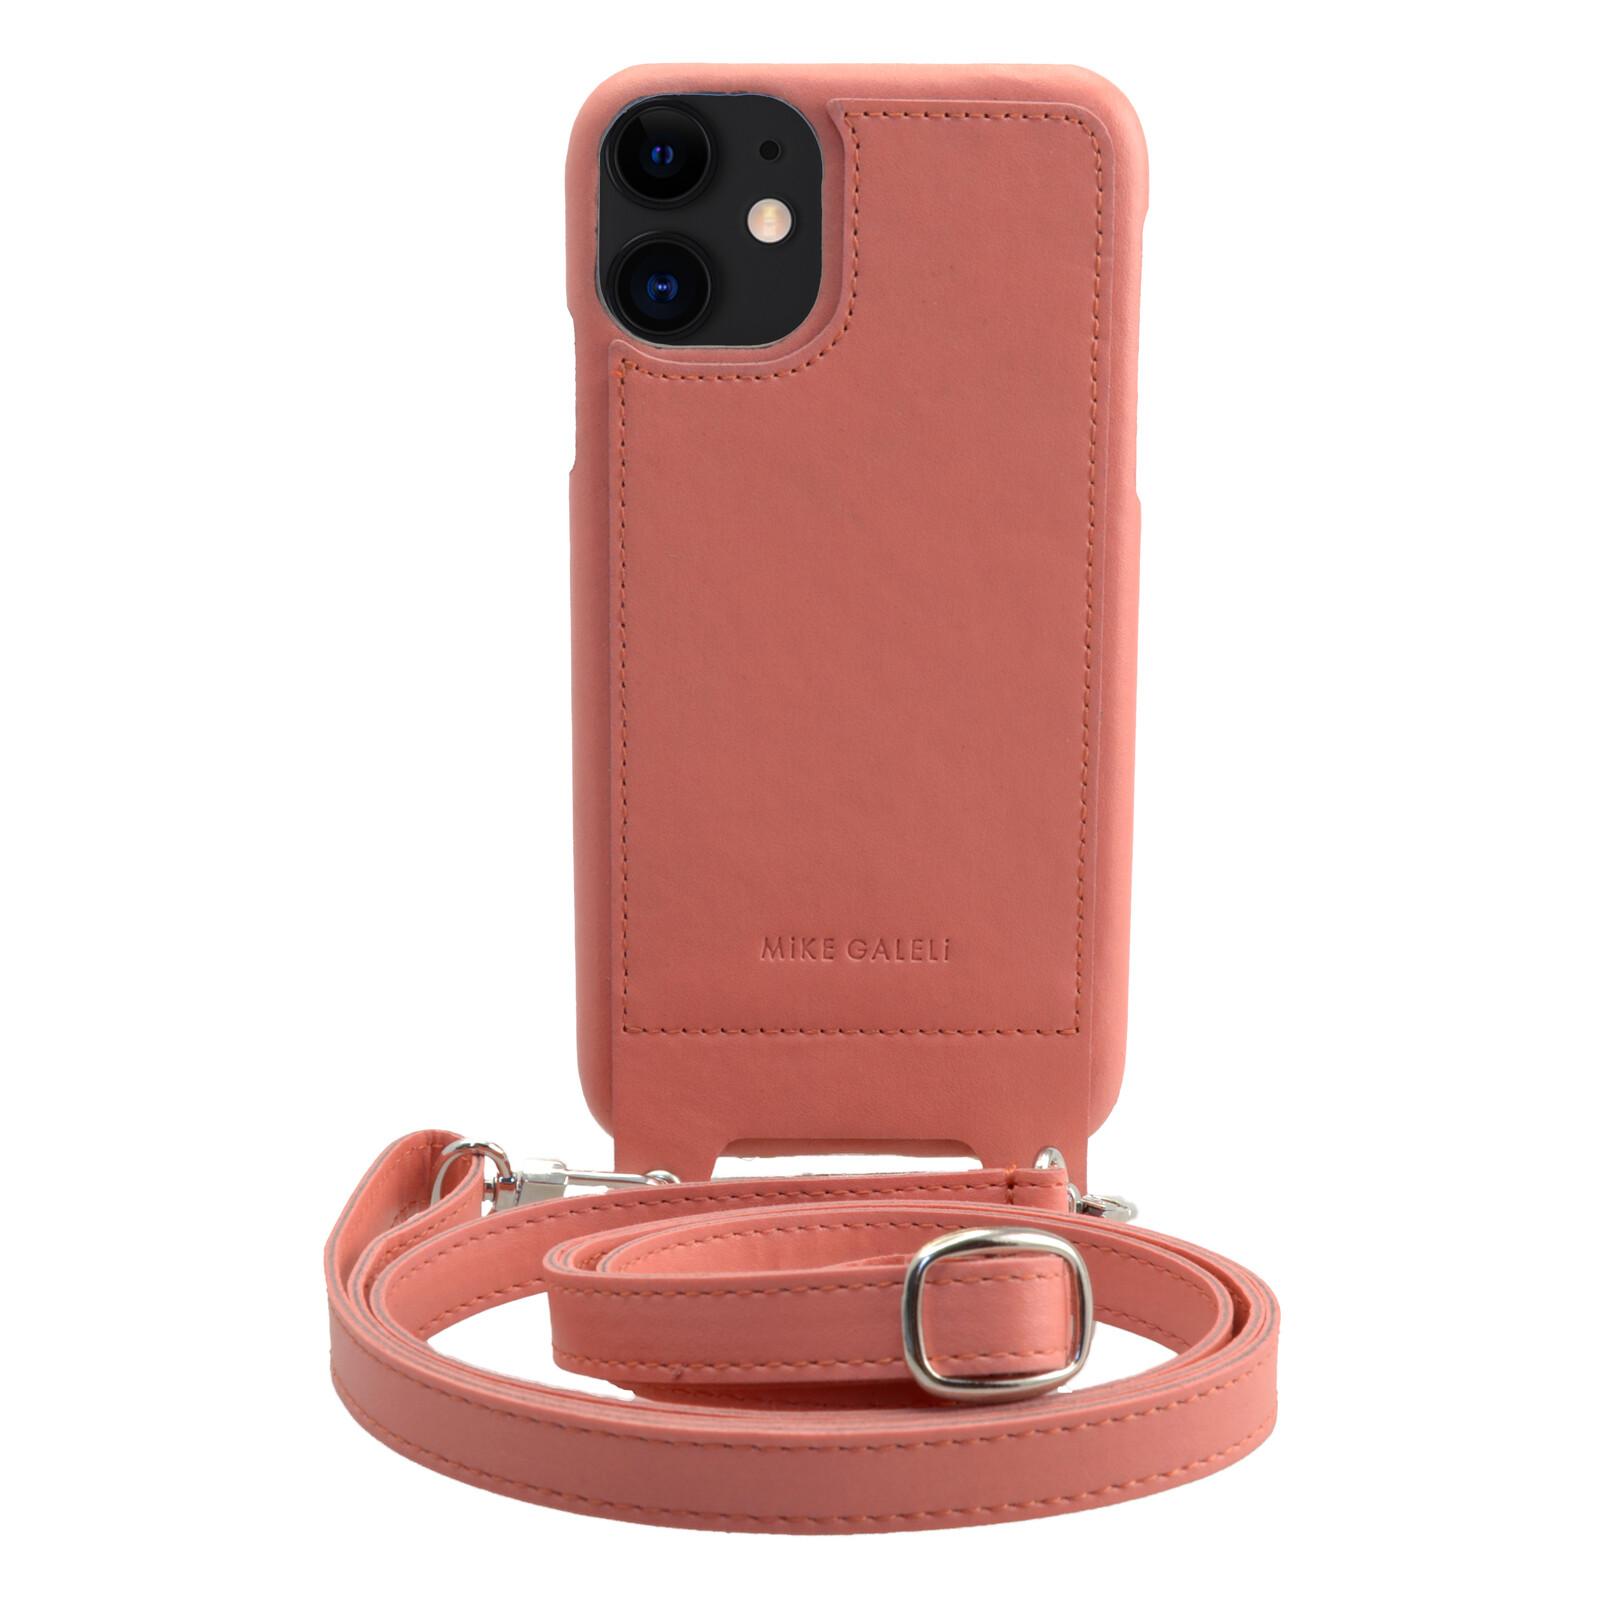 Galeli Backcover LENNY lite GO App iPhone 11 Band salmon